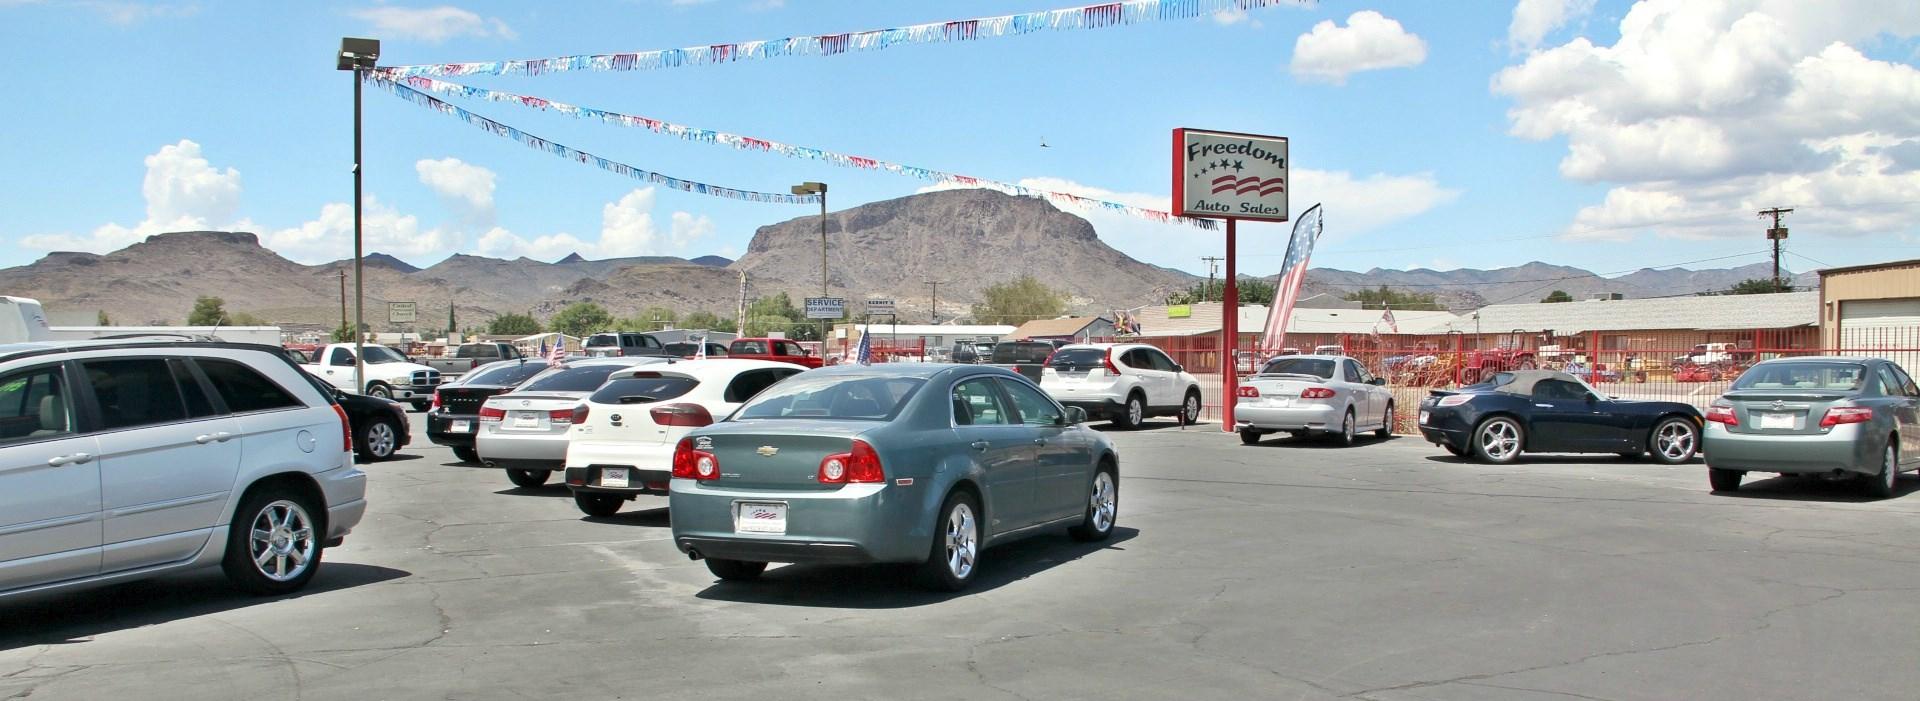 Ford Dealer in Kingman, AZ | Used Cars Kingman | Anderson ...